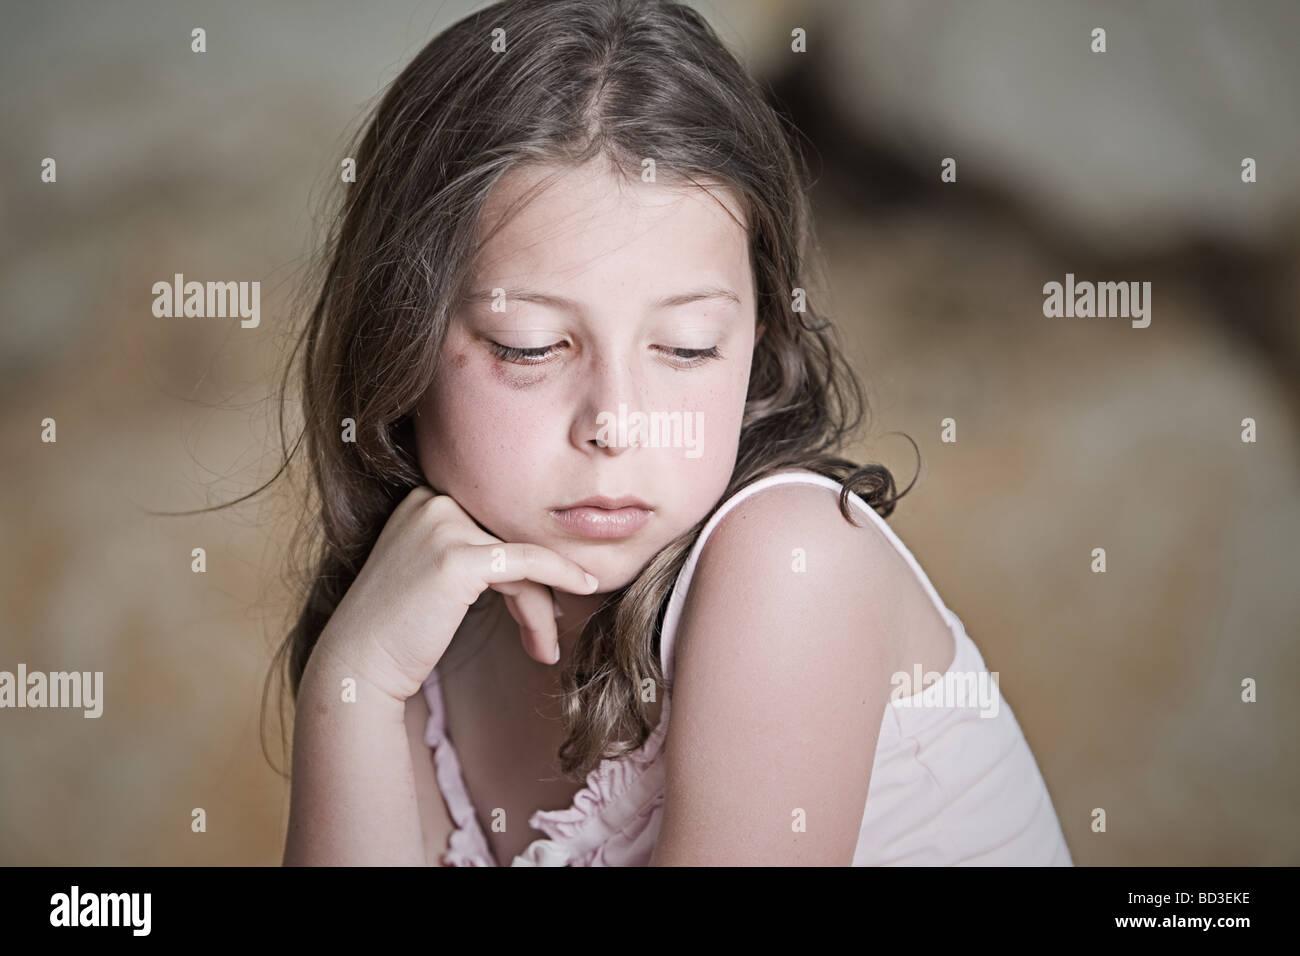 Powerful Shot of a Sad Child with Black Eye - Stock Image